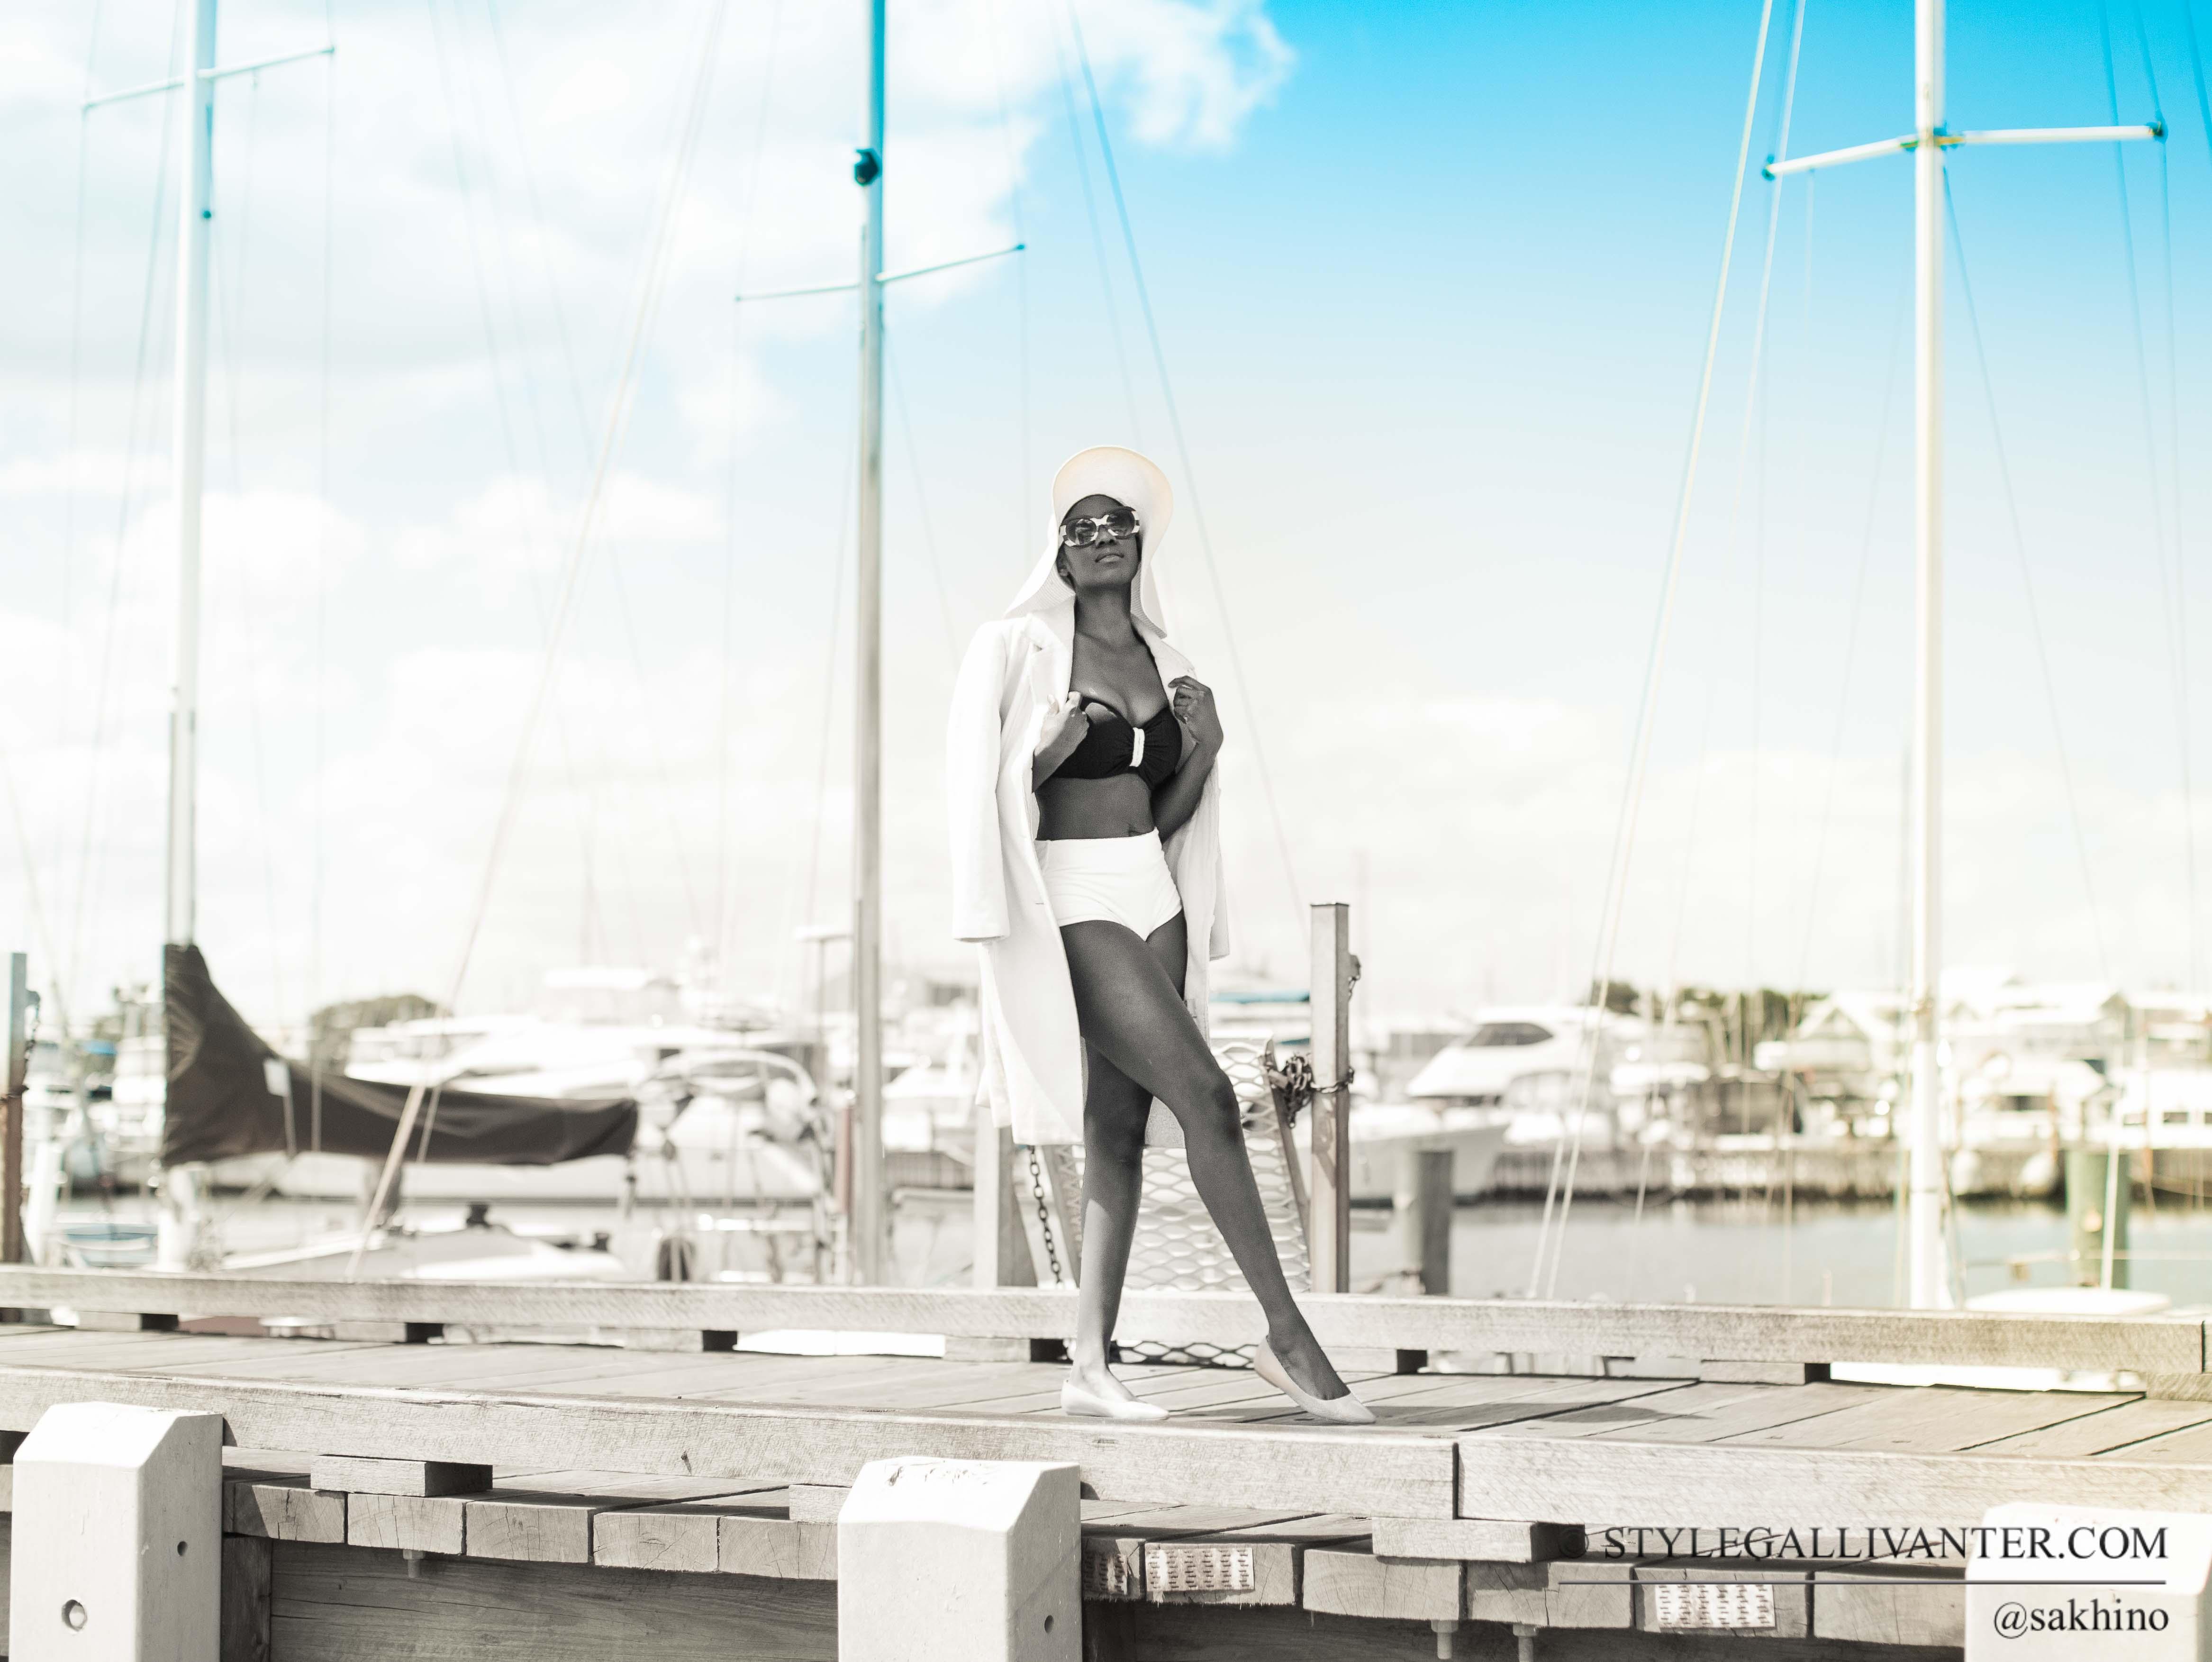 swimwear-trends-2015_top-models-melbourne_best-african-black-models-melbourne-australia_fashfest-models_surania_topfashion-blogs-africa